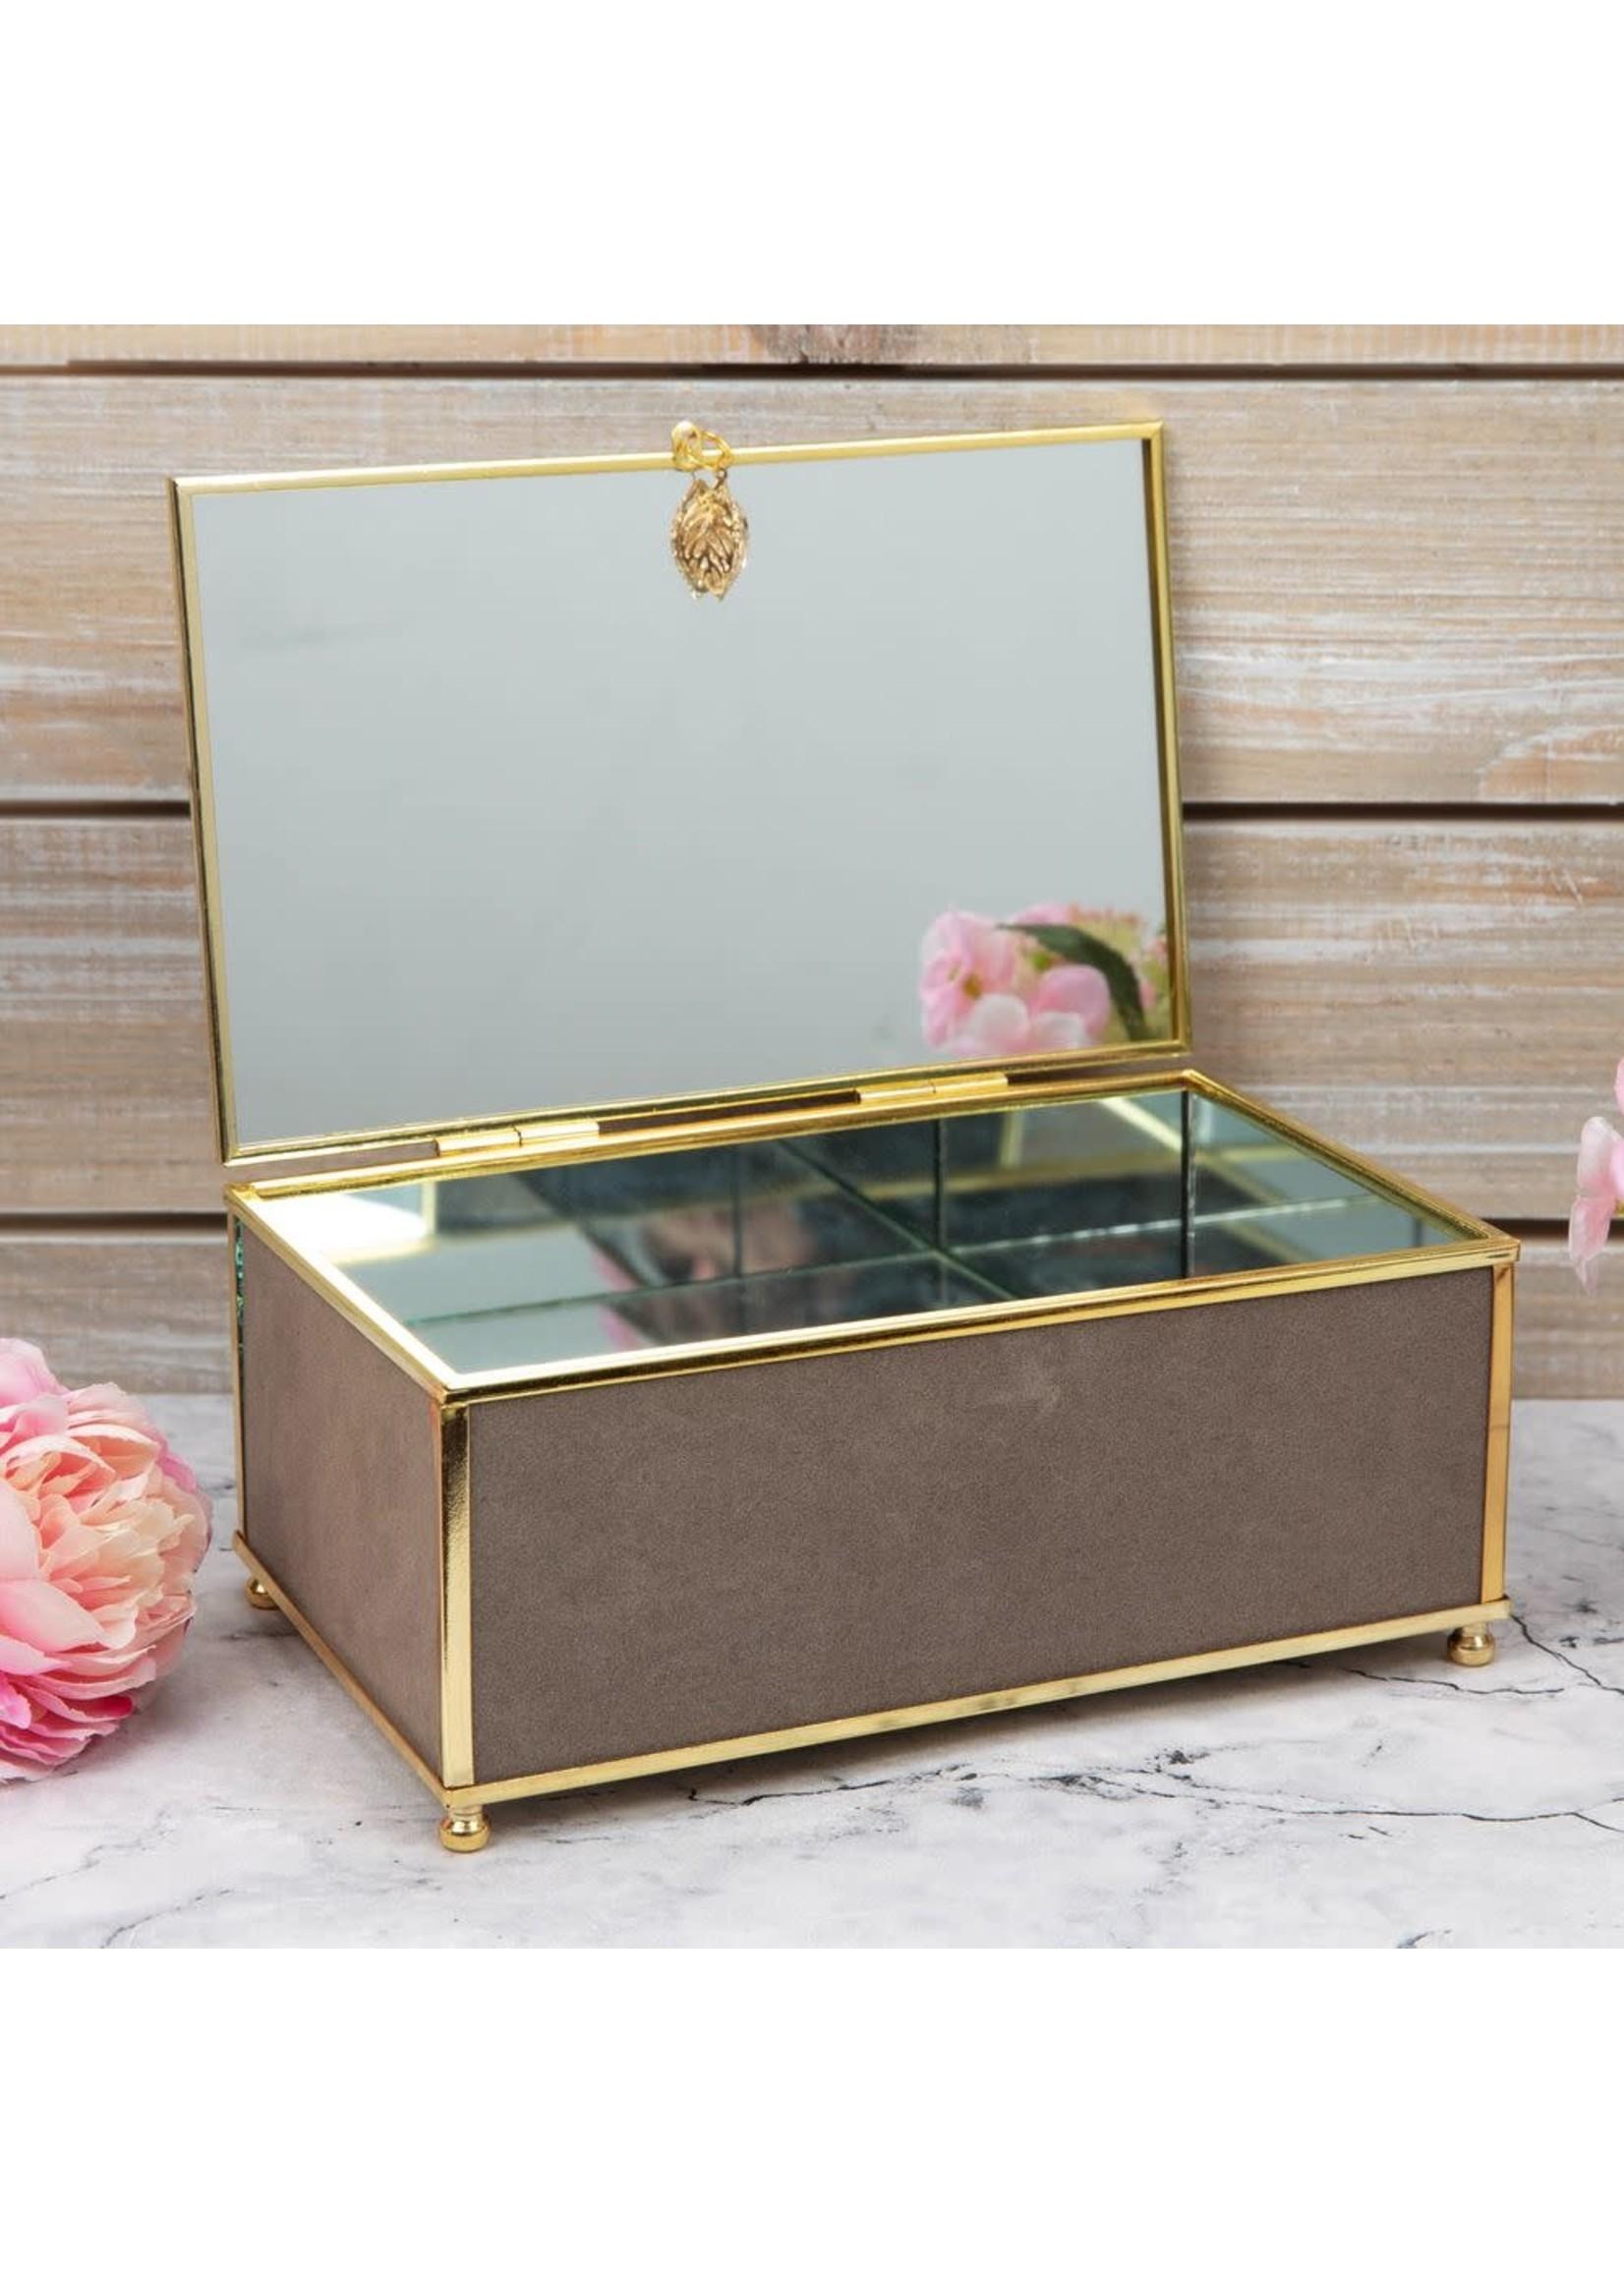 SOPHIA GREY JEWELLERY BOX WITH GOLD LEAF DETAIL - MEDIUM